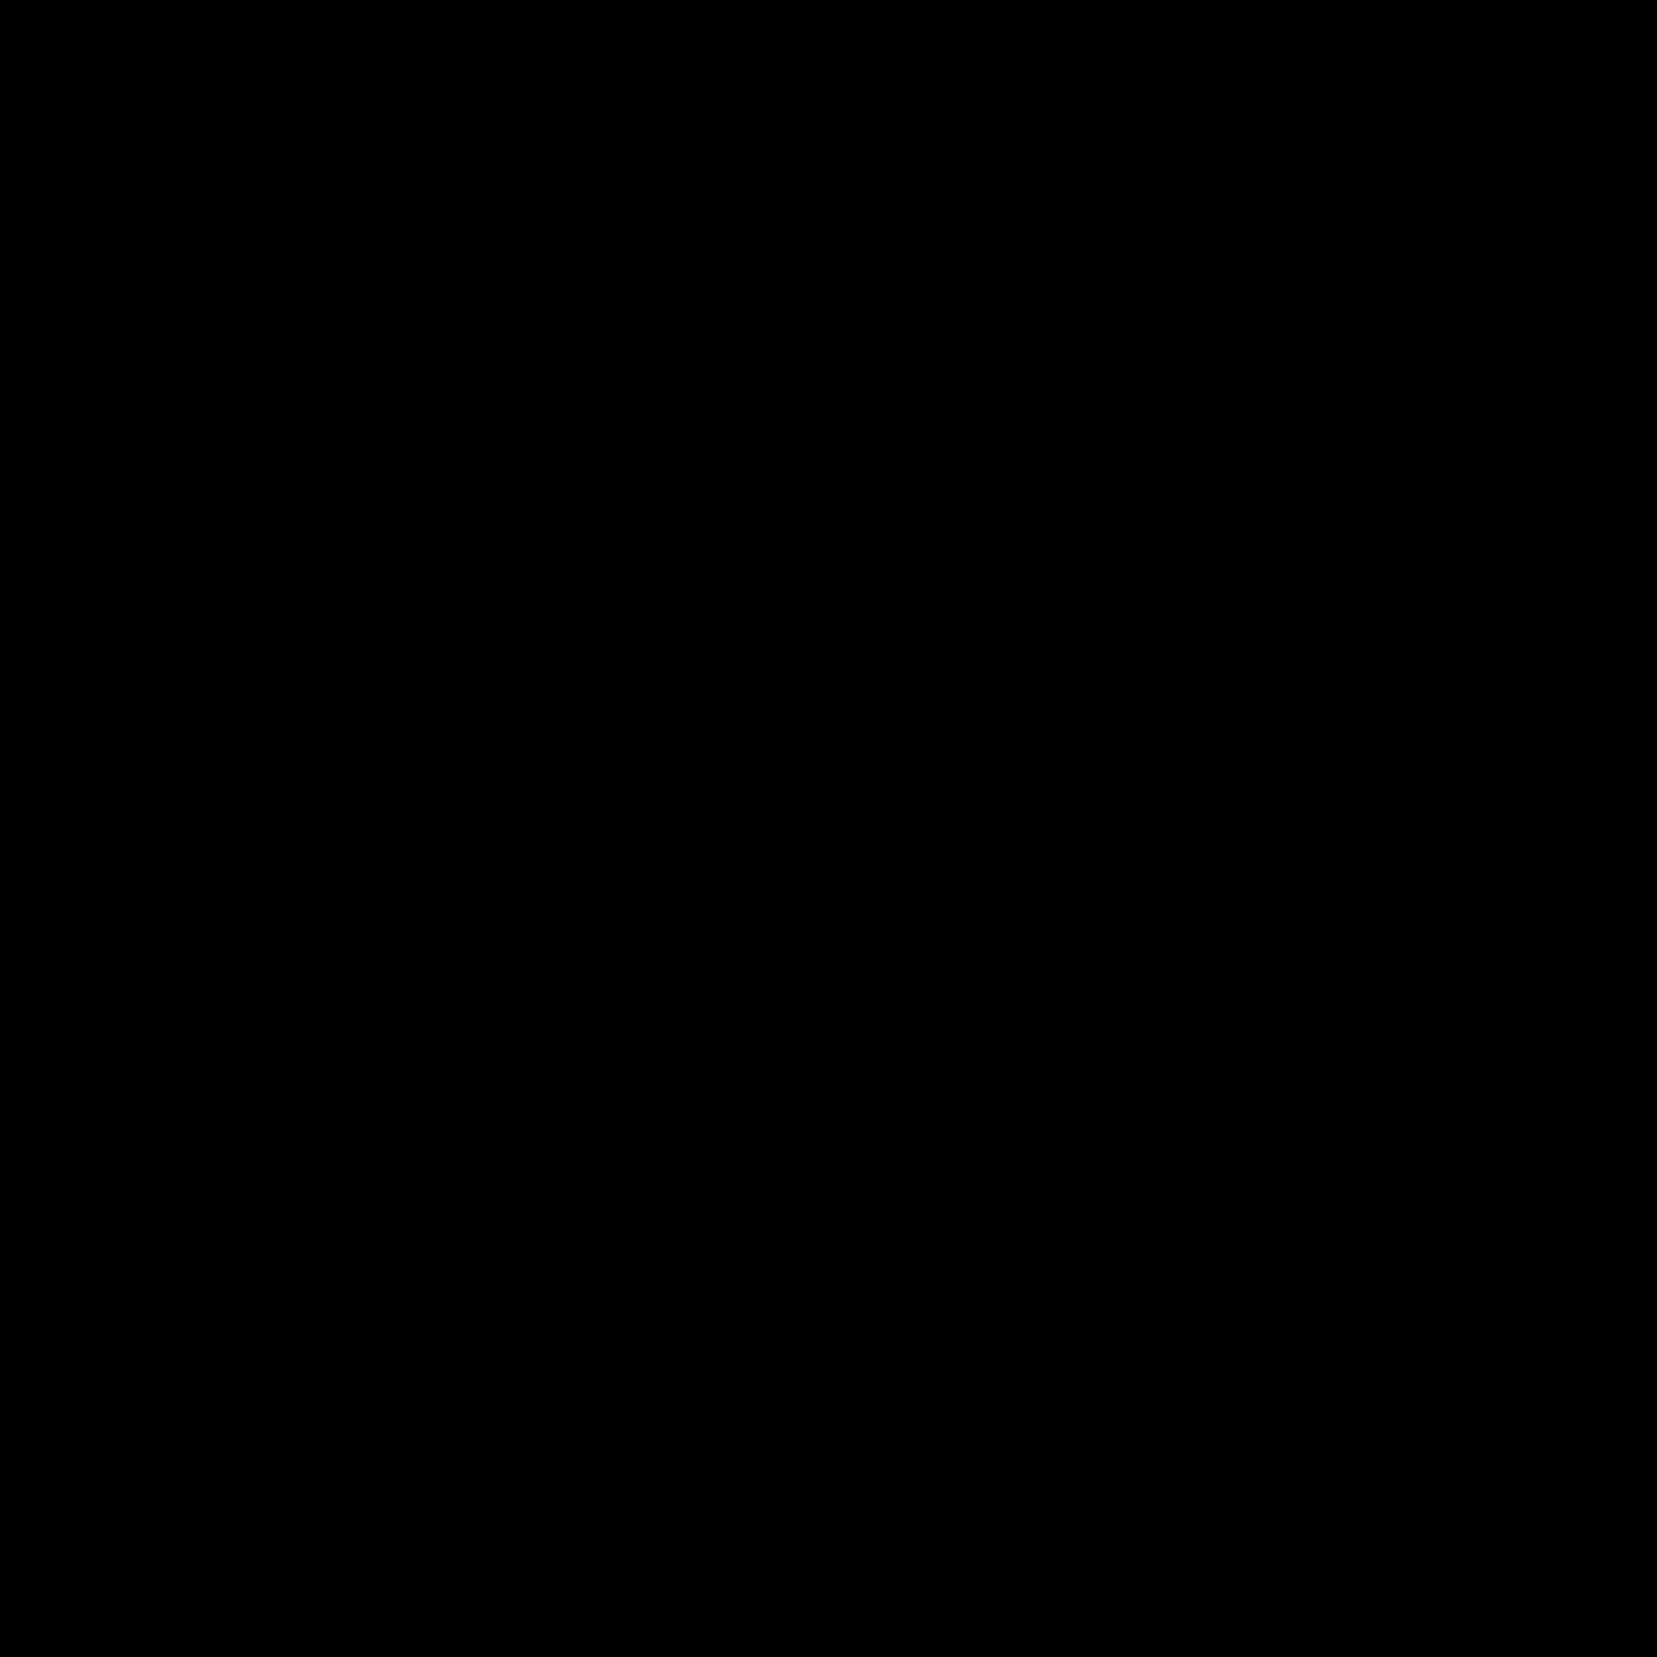 4-Davolls-Logos-7.15.16-04.png